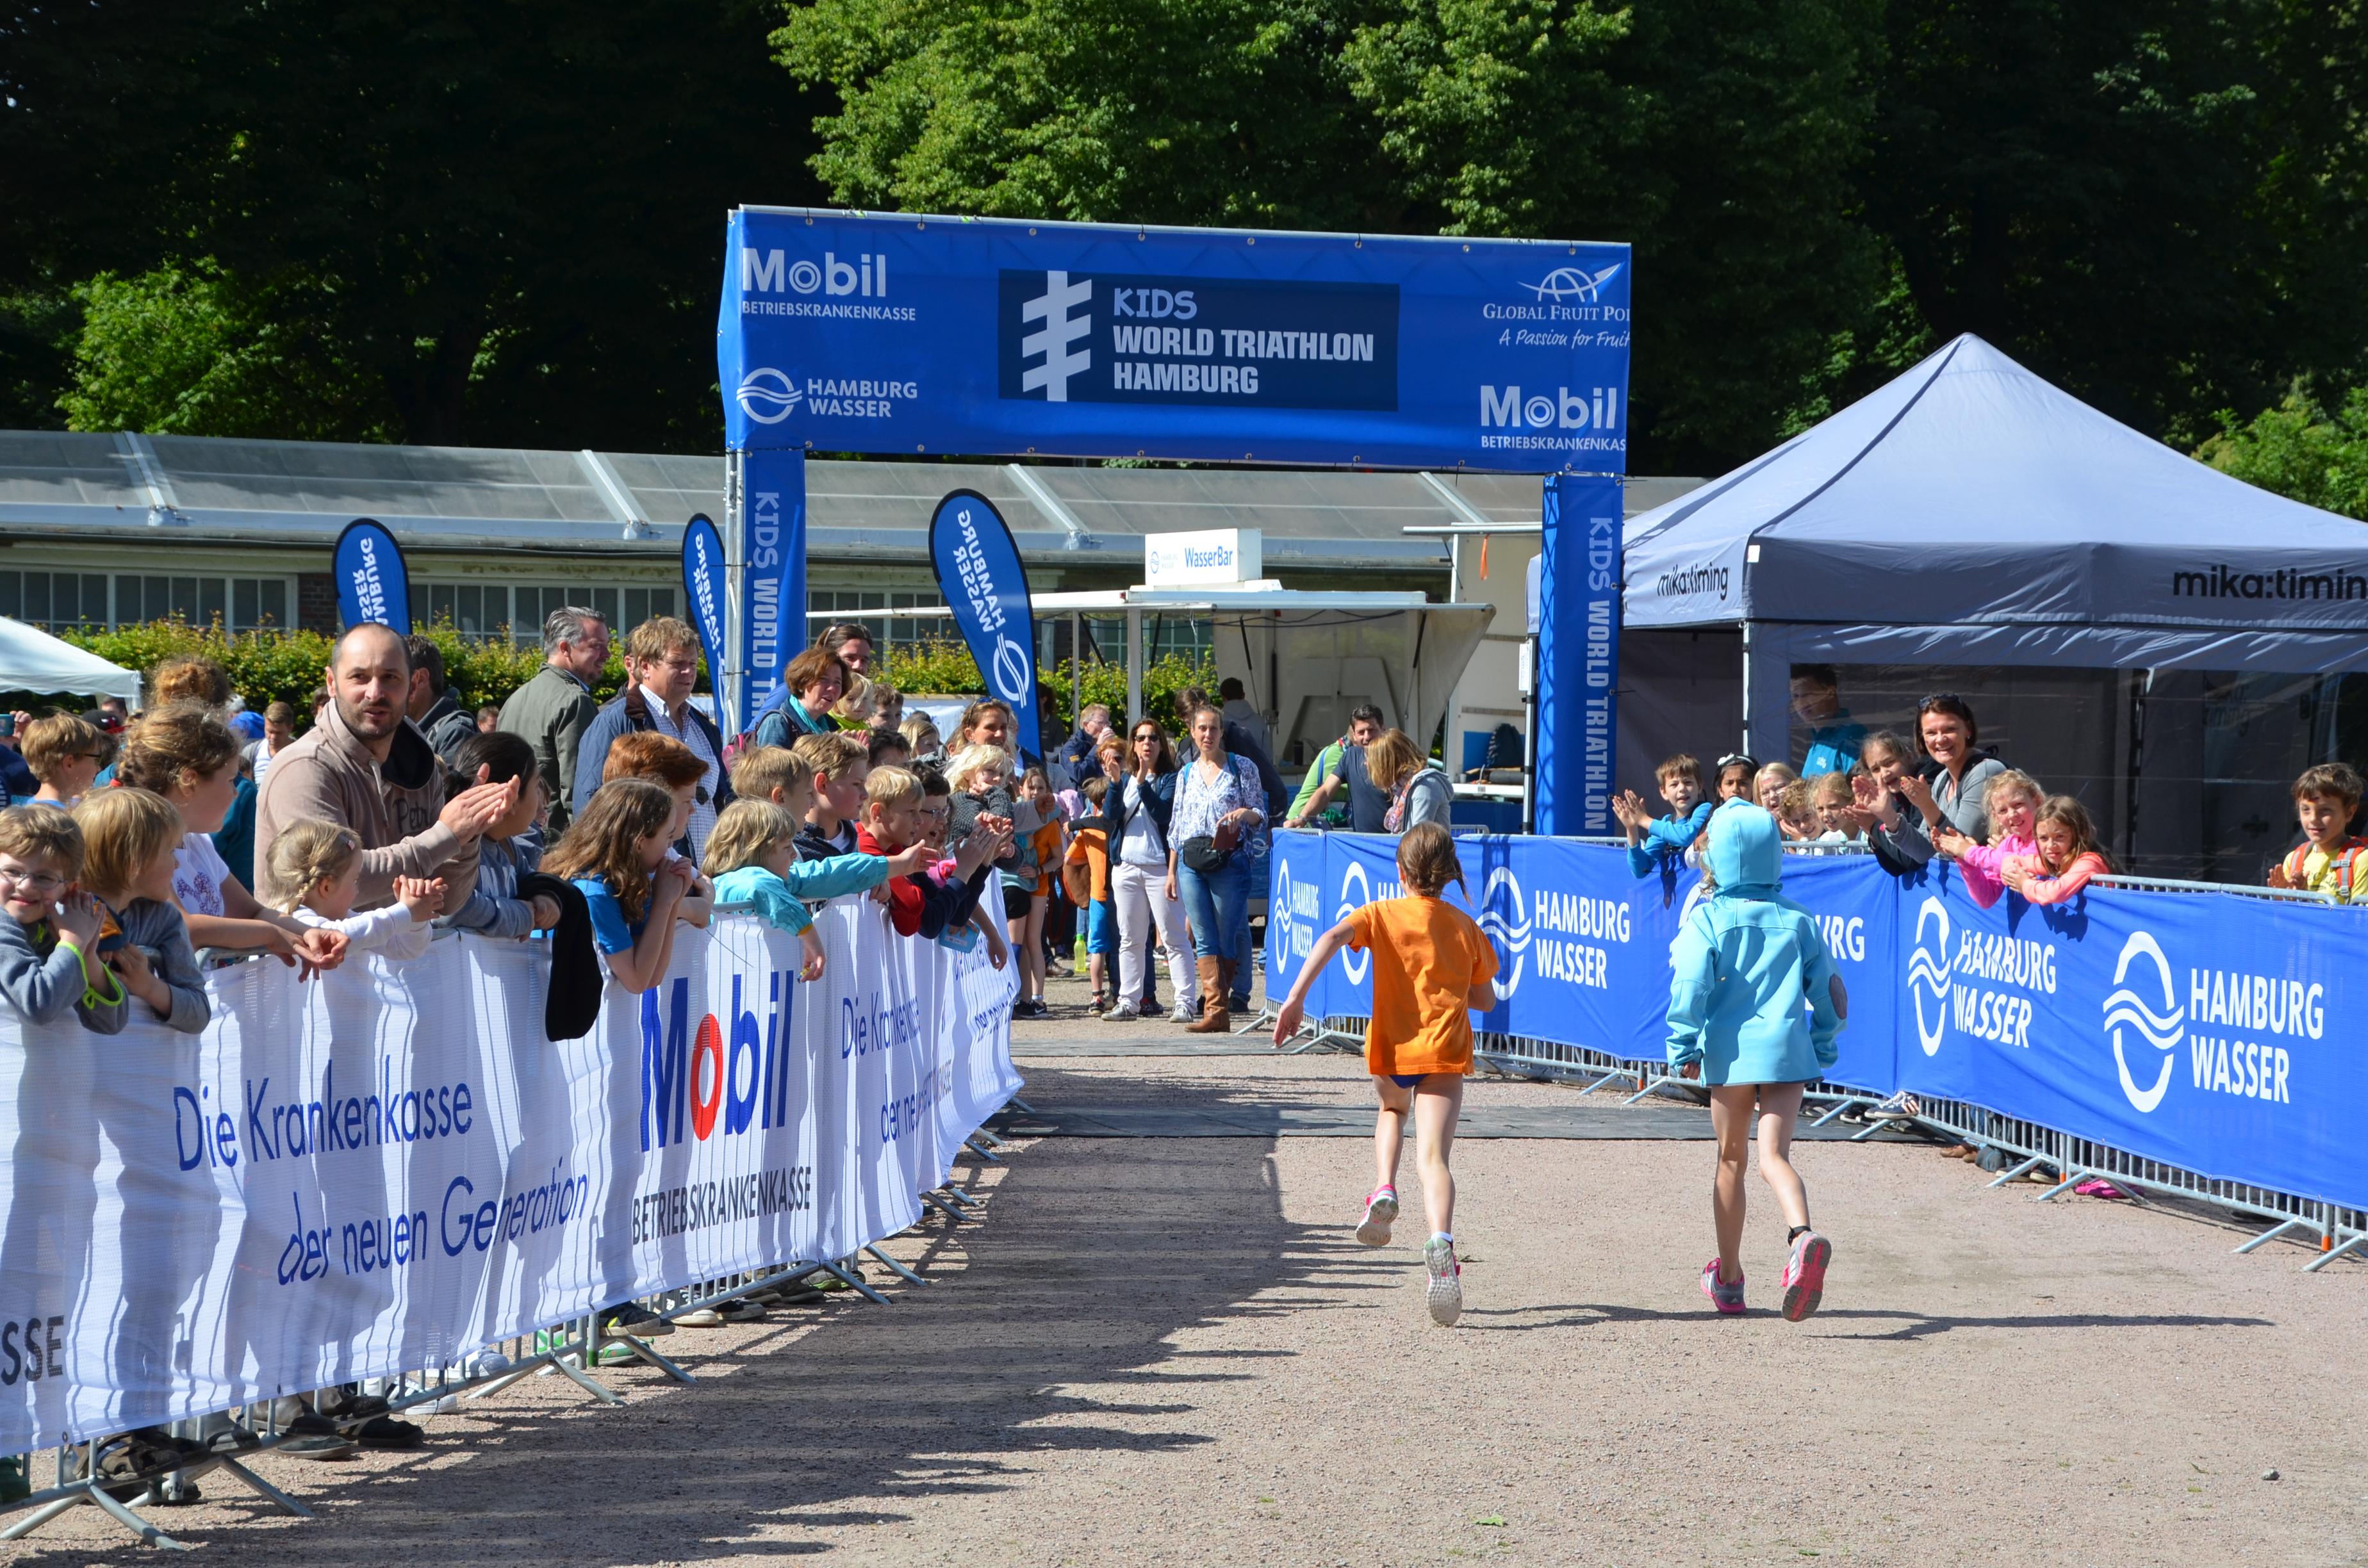 Kids World Triathlon Hamburg Bkk Mobil Oil